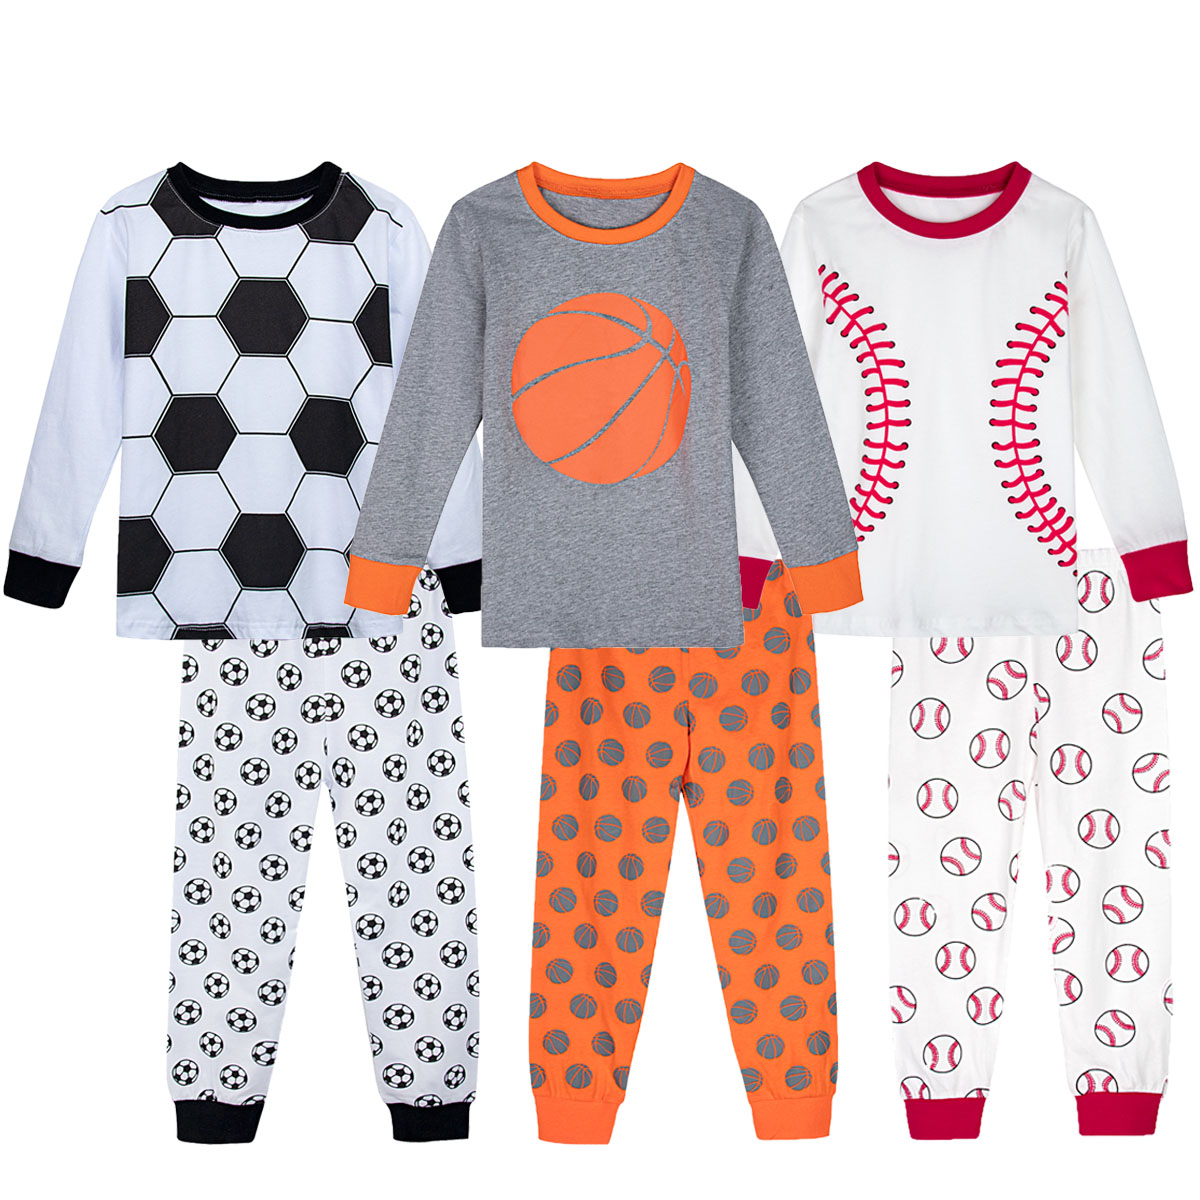 Kids Boys Winter Pajamas Set Children Dinosaur Baseball Soccer Sport Sleepwear Toddler Long Sleeve Top With Pants Nightwear 2PCS